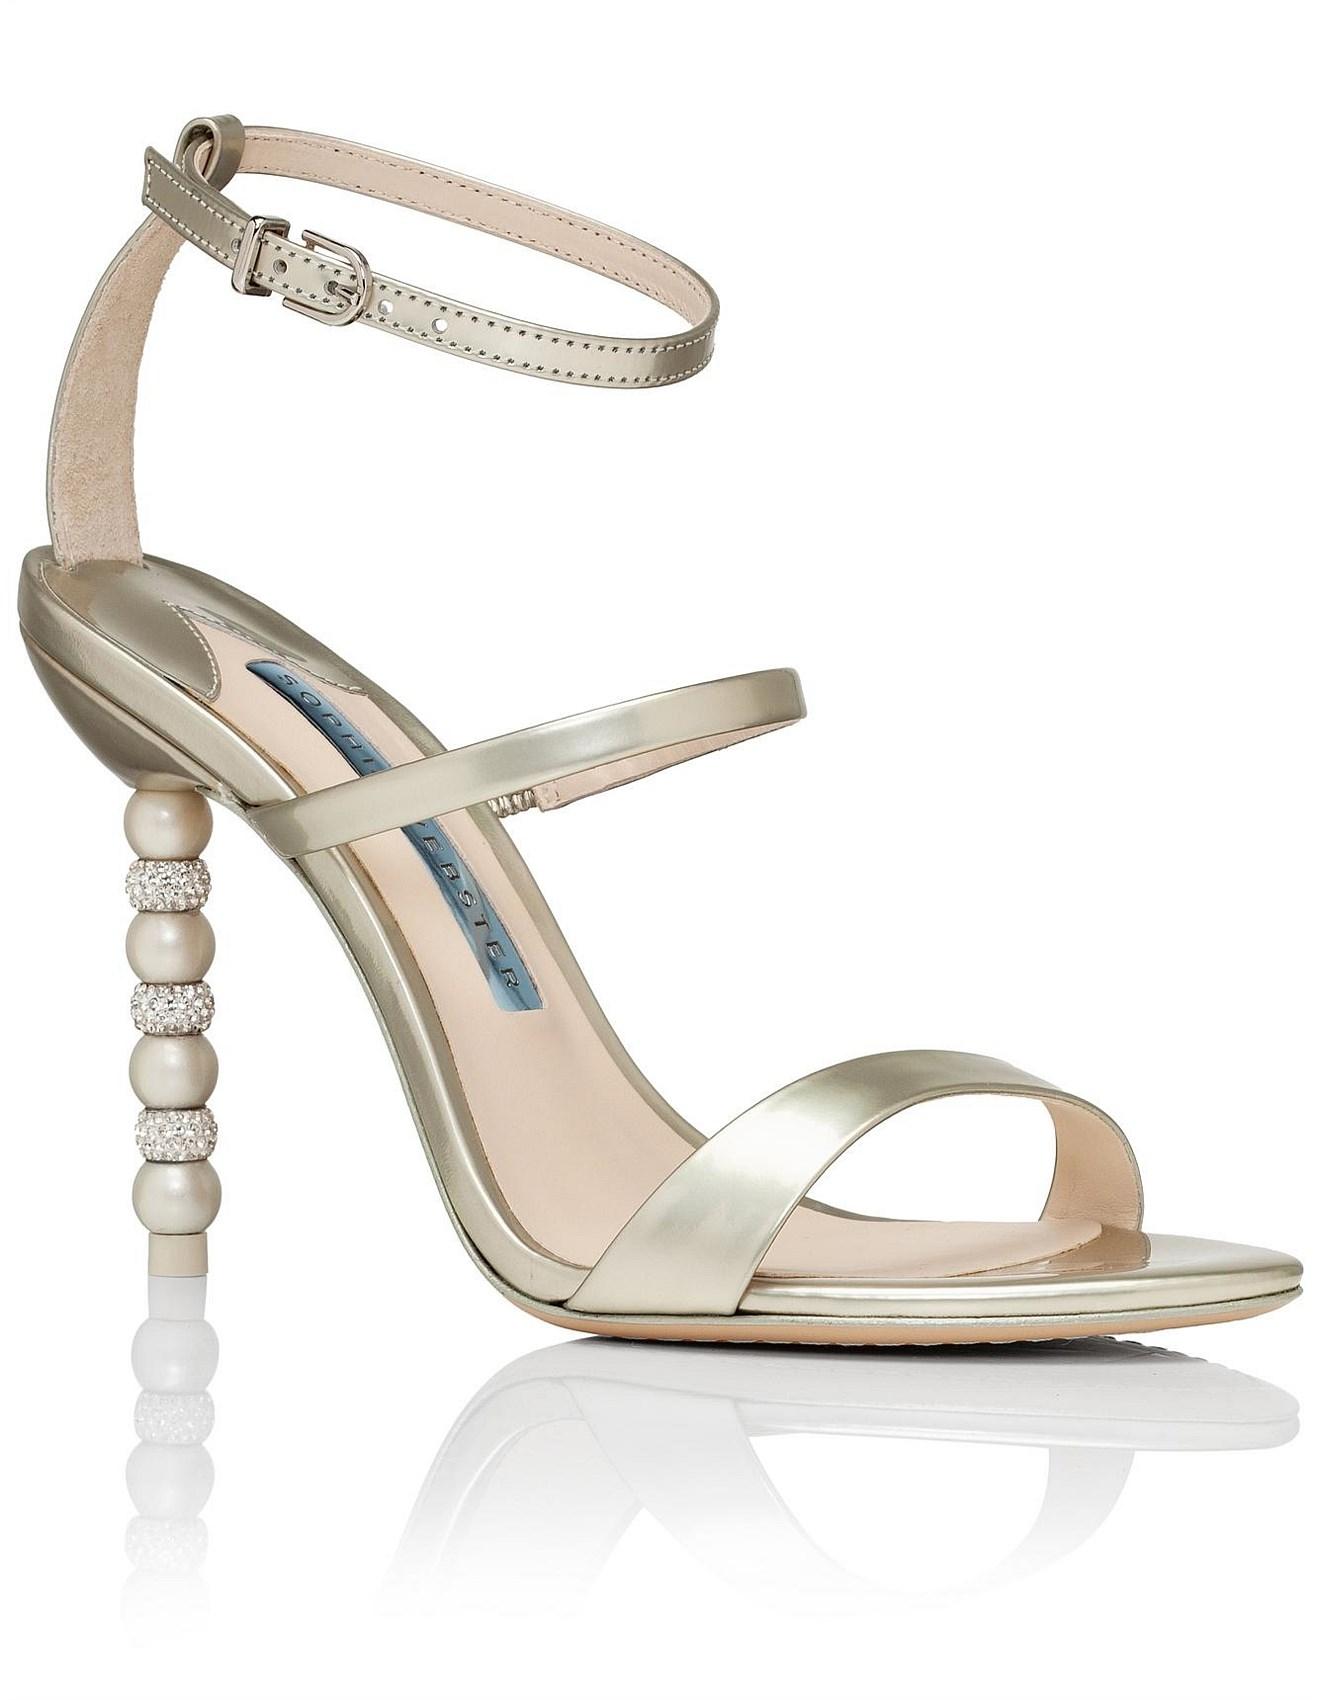 83e4dbbc1 Sophia Webster - Rosalind Crystal   Pearl Sandal